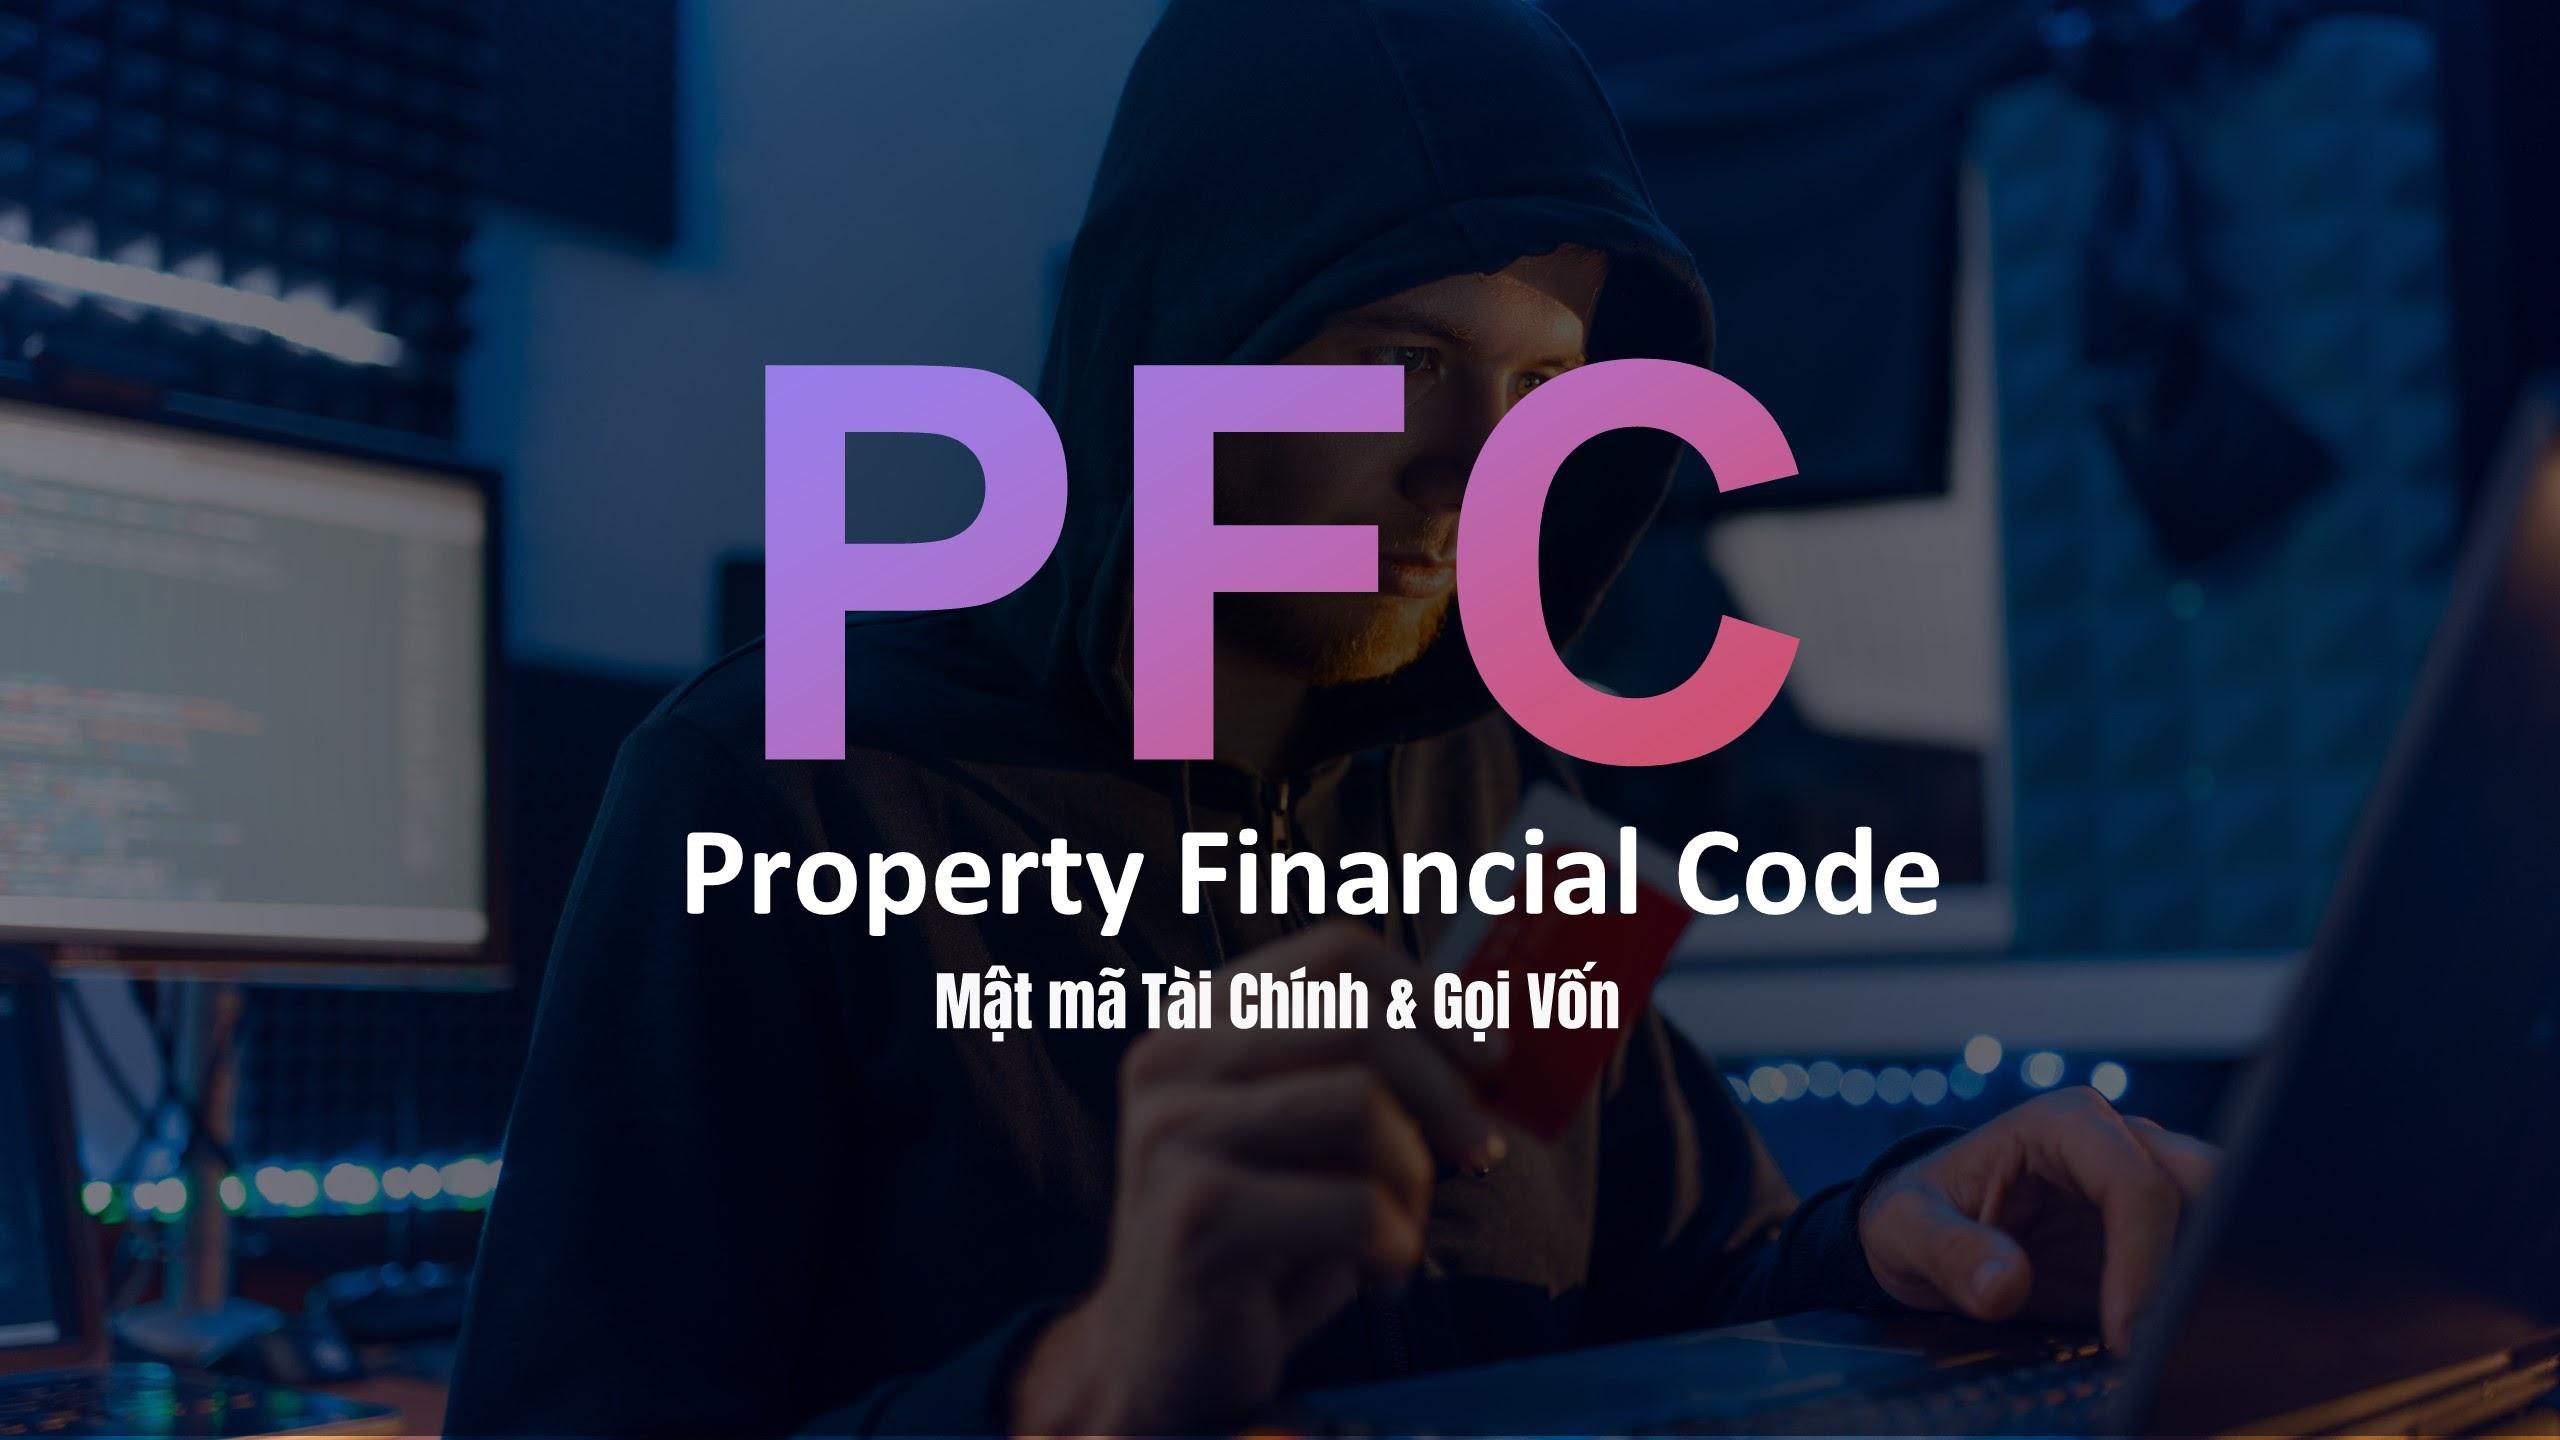 Share khóa học PFC : Property Financial Code